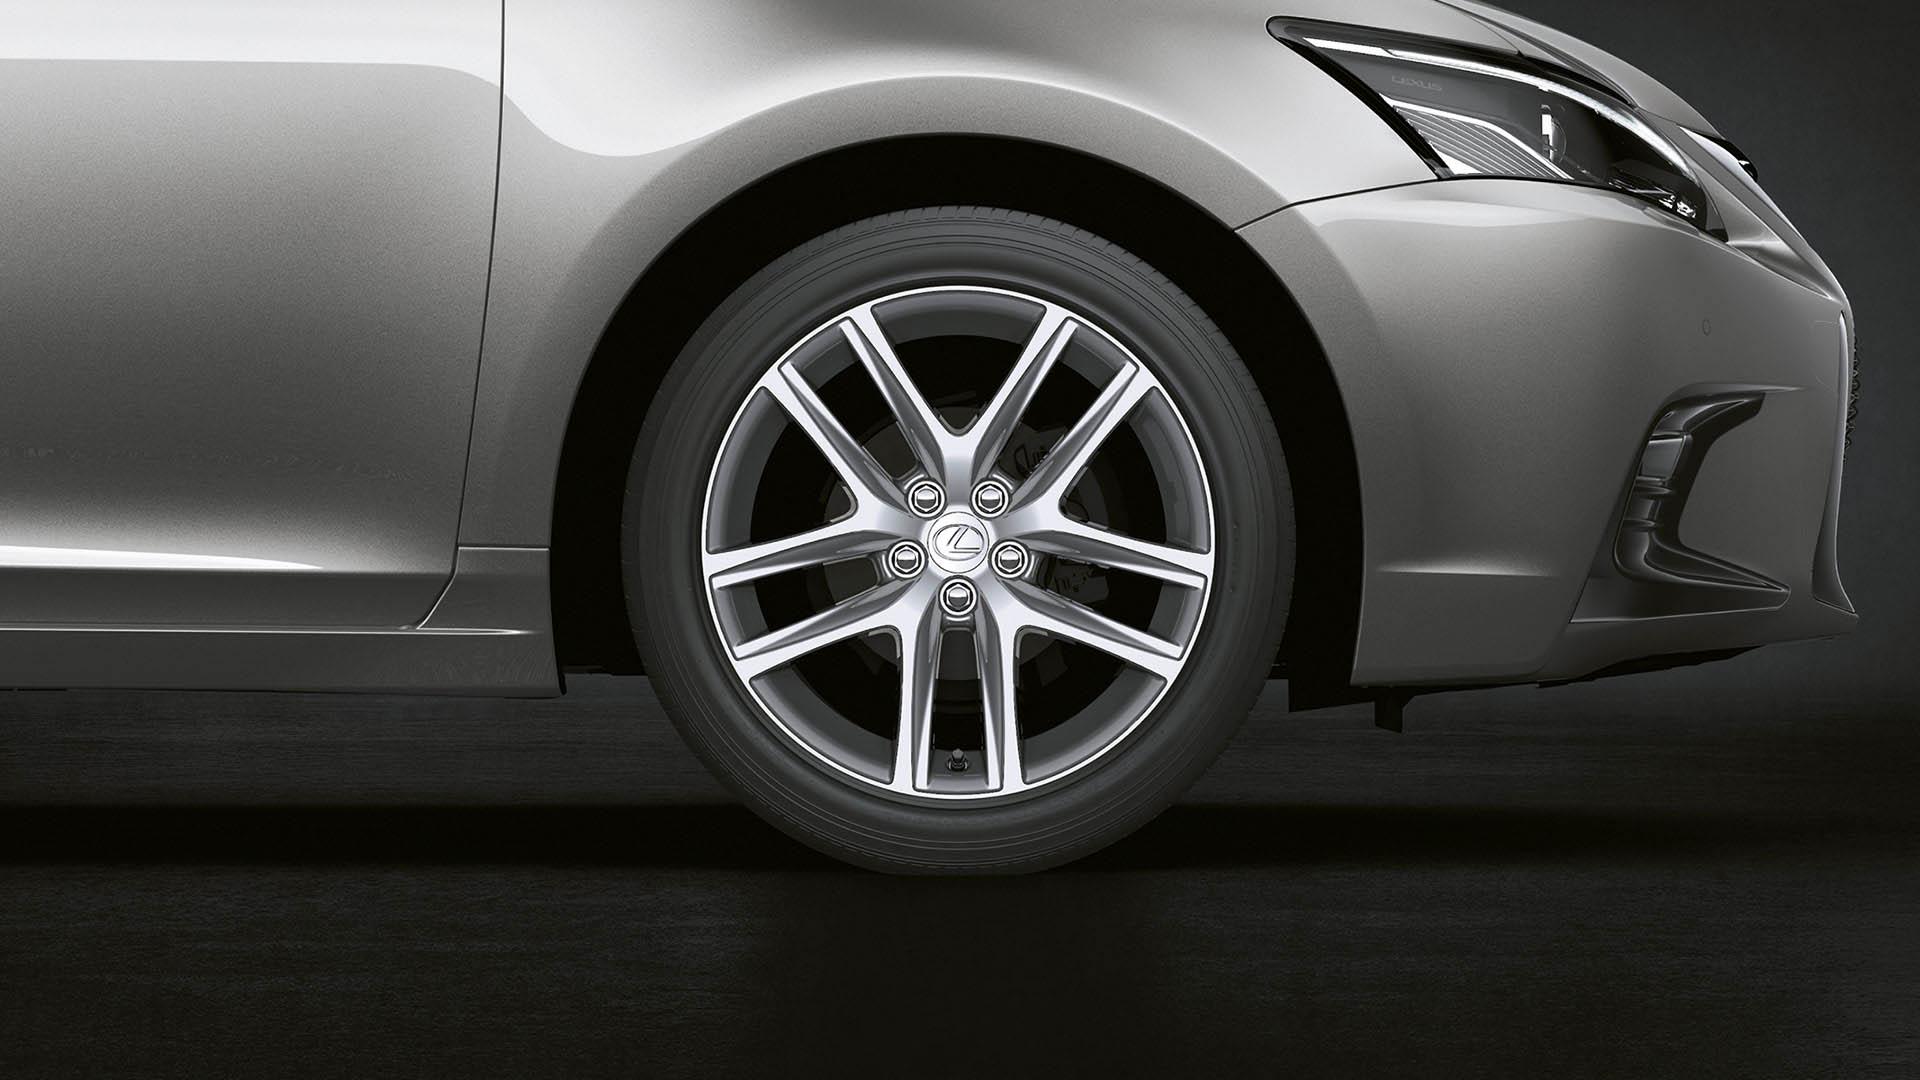 2018 lexus ct 200h my18 features alloys 17